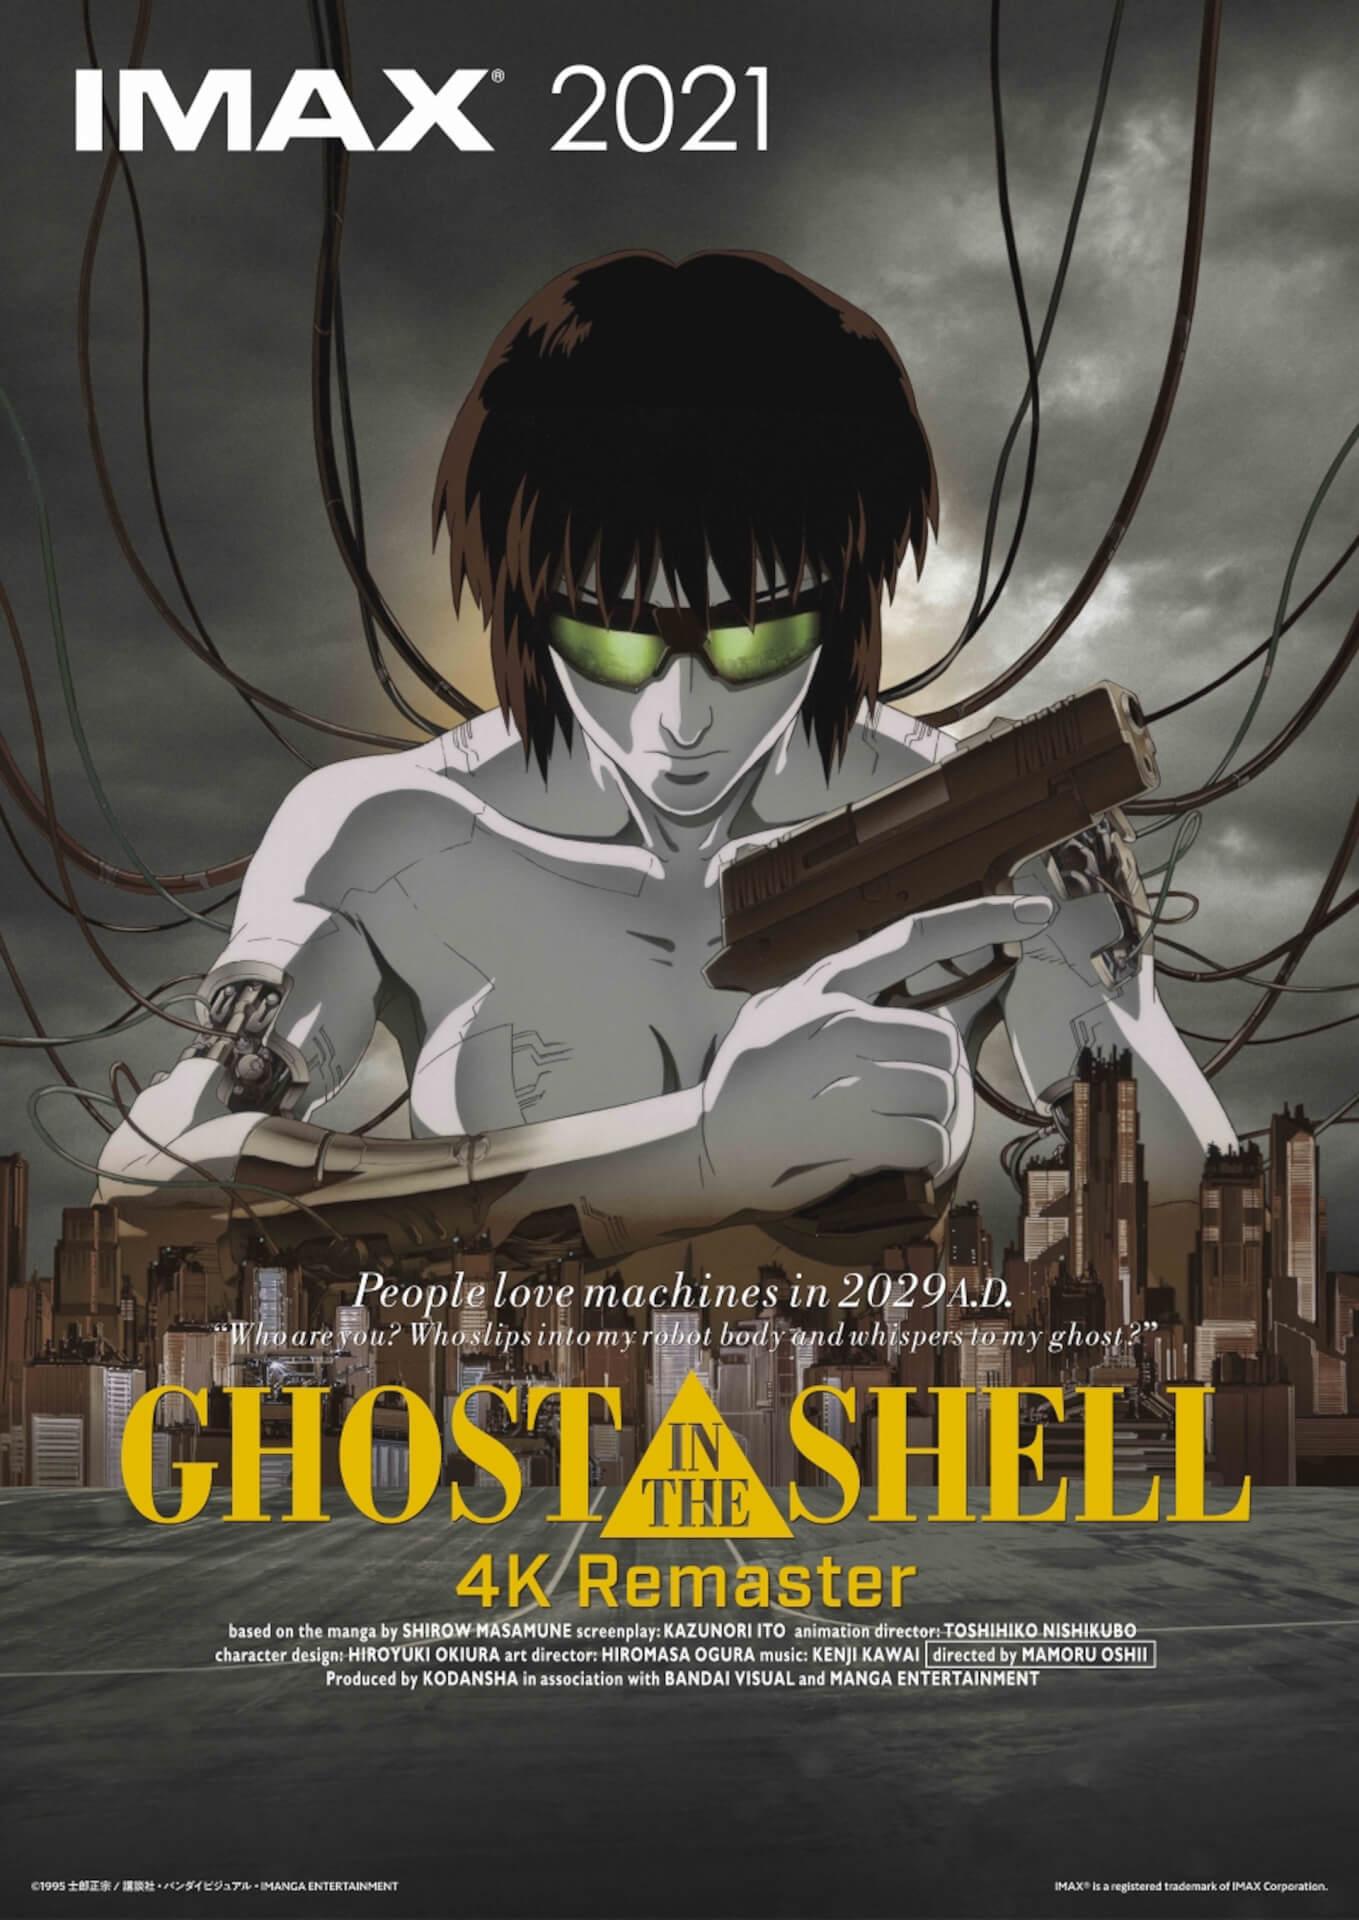 『GHOST IN THE SHELL/攻殻機動隊 4Kリマスター版』がIMAX&通常上映決定!押井守からのコメントも film210820_ghostintheshell_imax_10